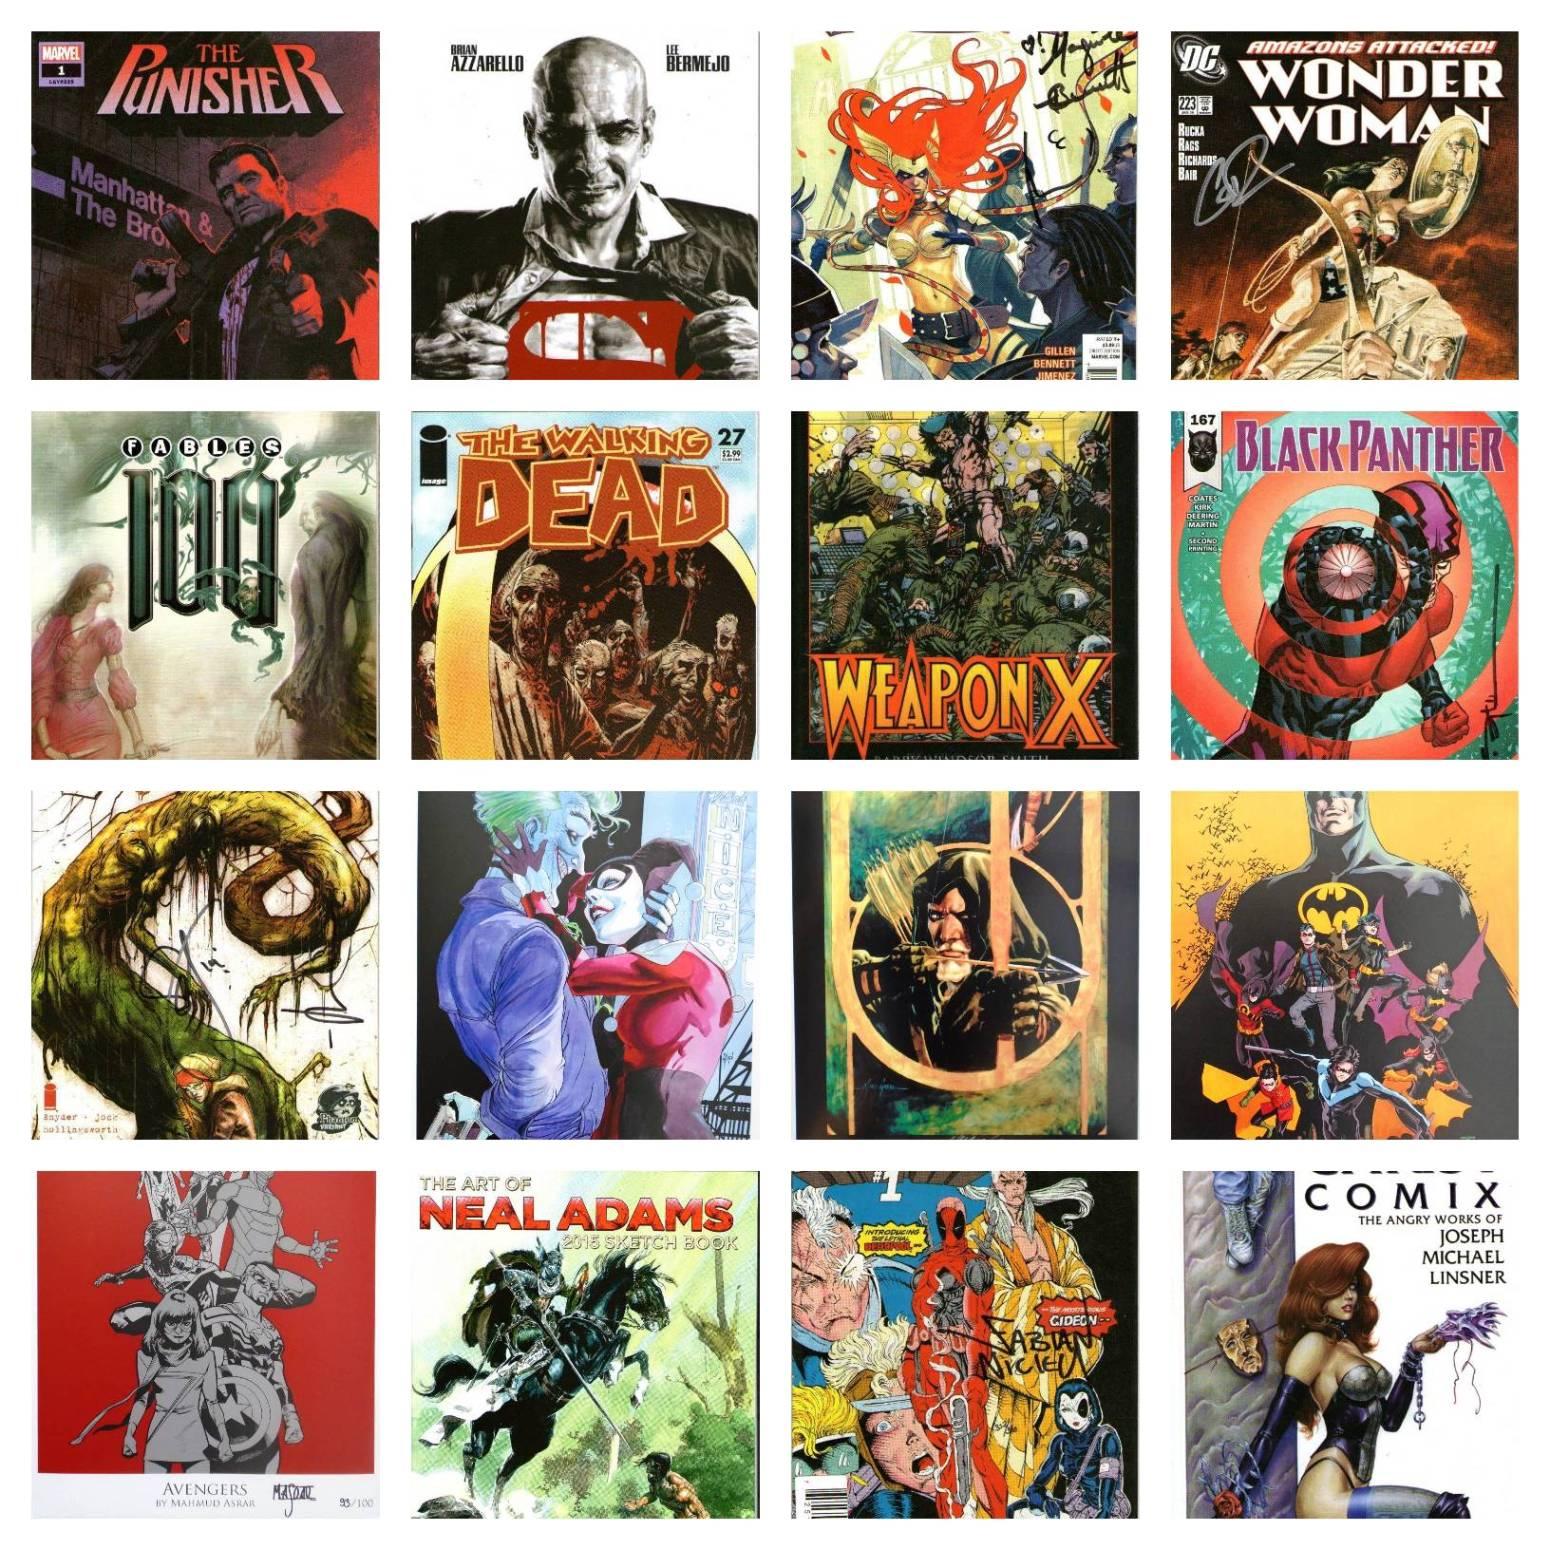 Lucky_Target_Comics_Signed_selection.jpg